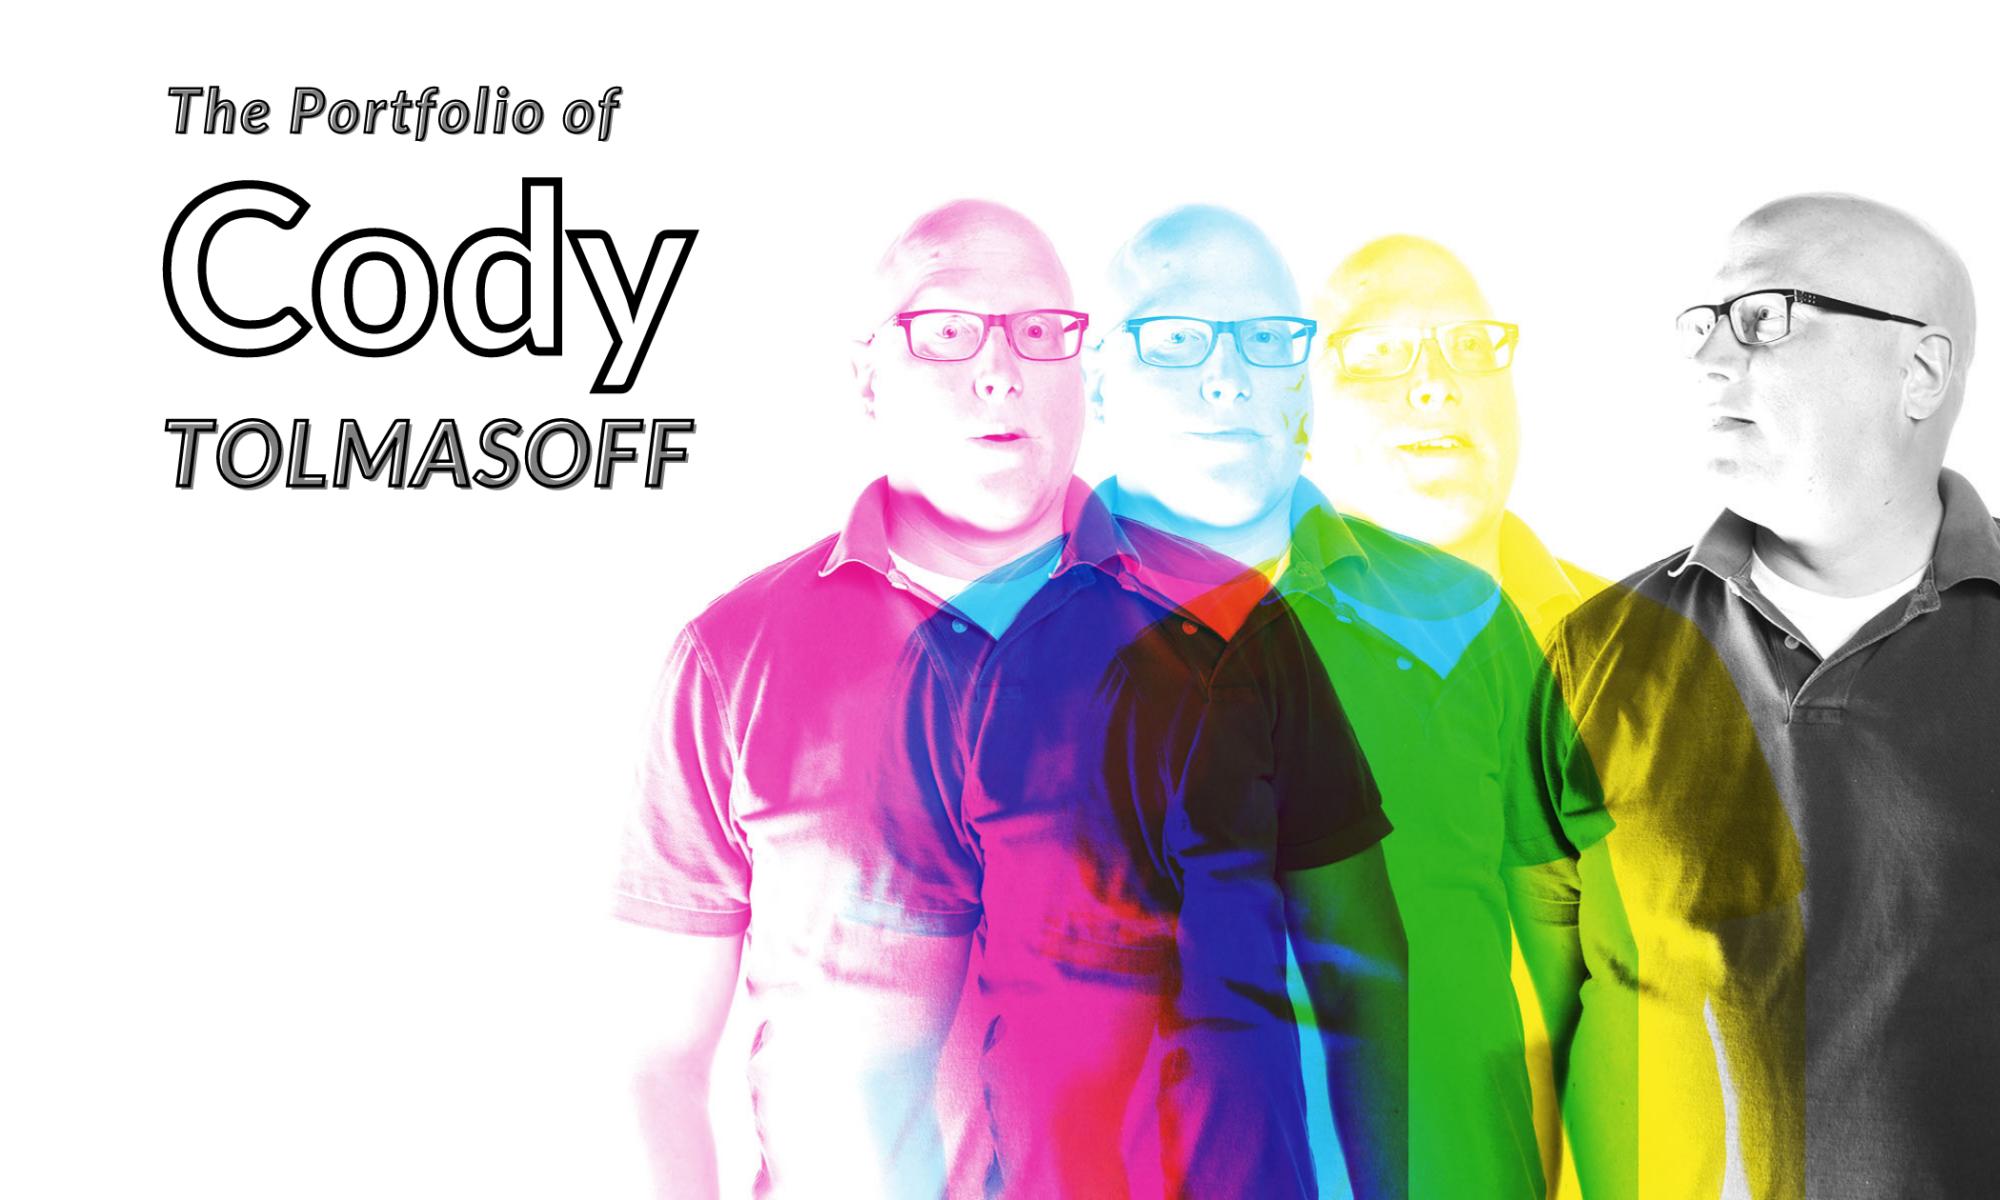 The Portfolio of R. Cody Tolmasoff